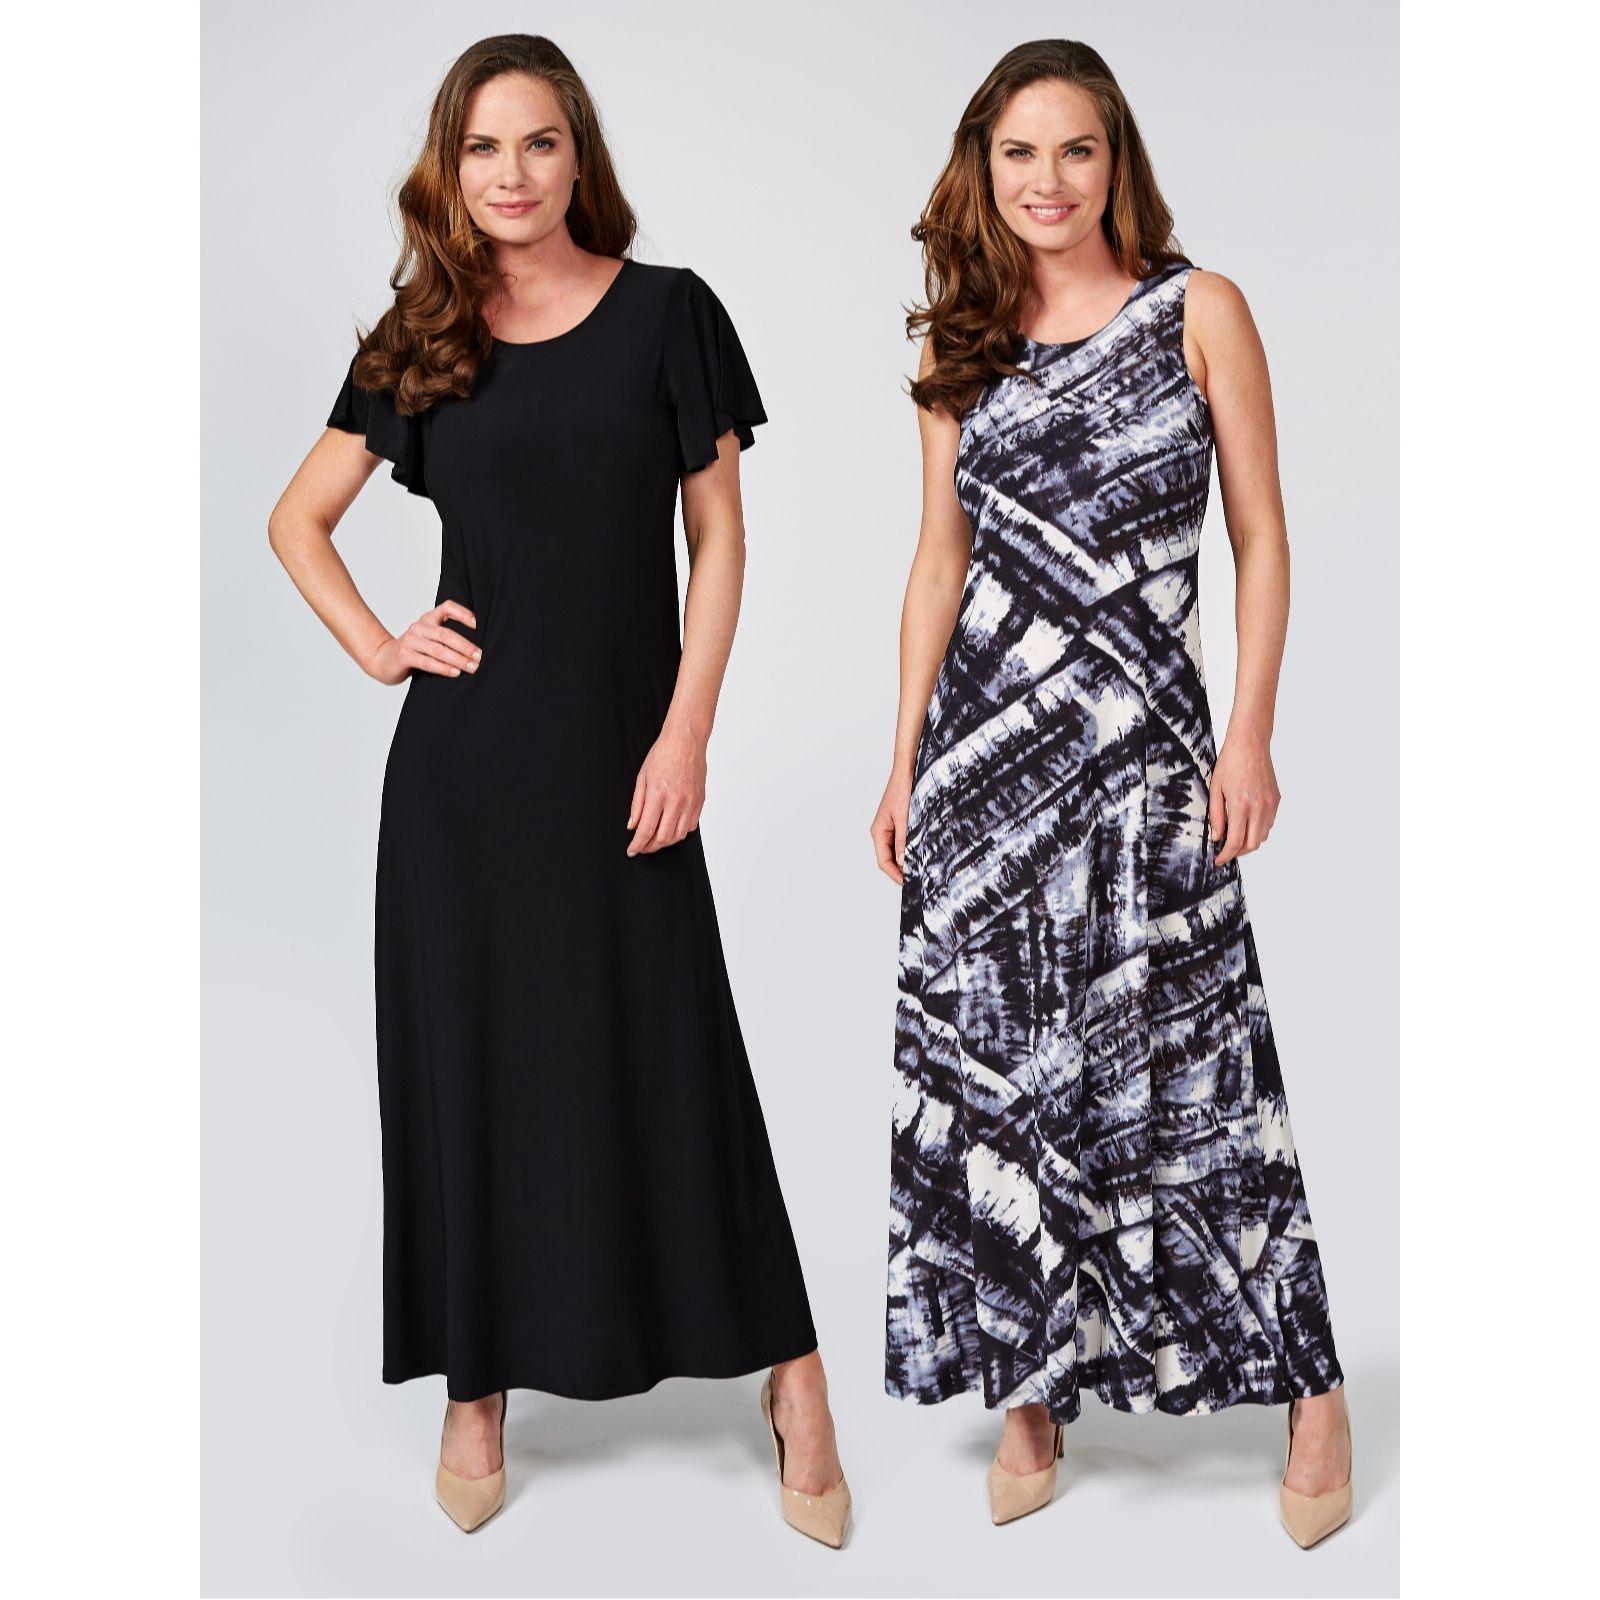 58a29e56c17 Attitudes by Renee Print   Plain Pack of 2 Maxi Dresses Petite Length - QVC  UK